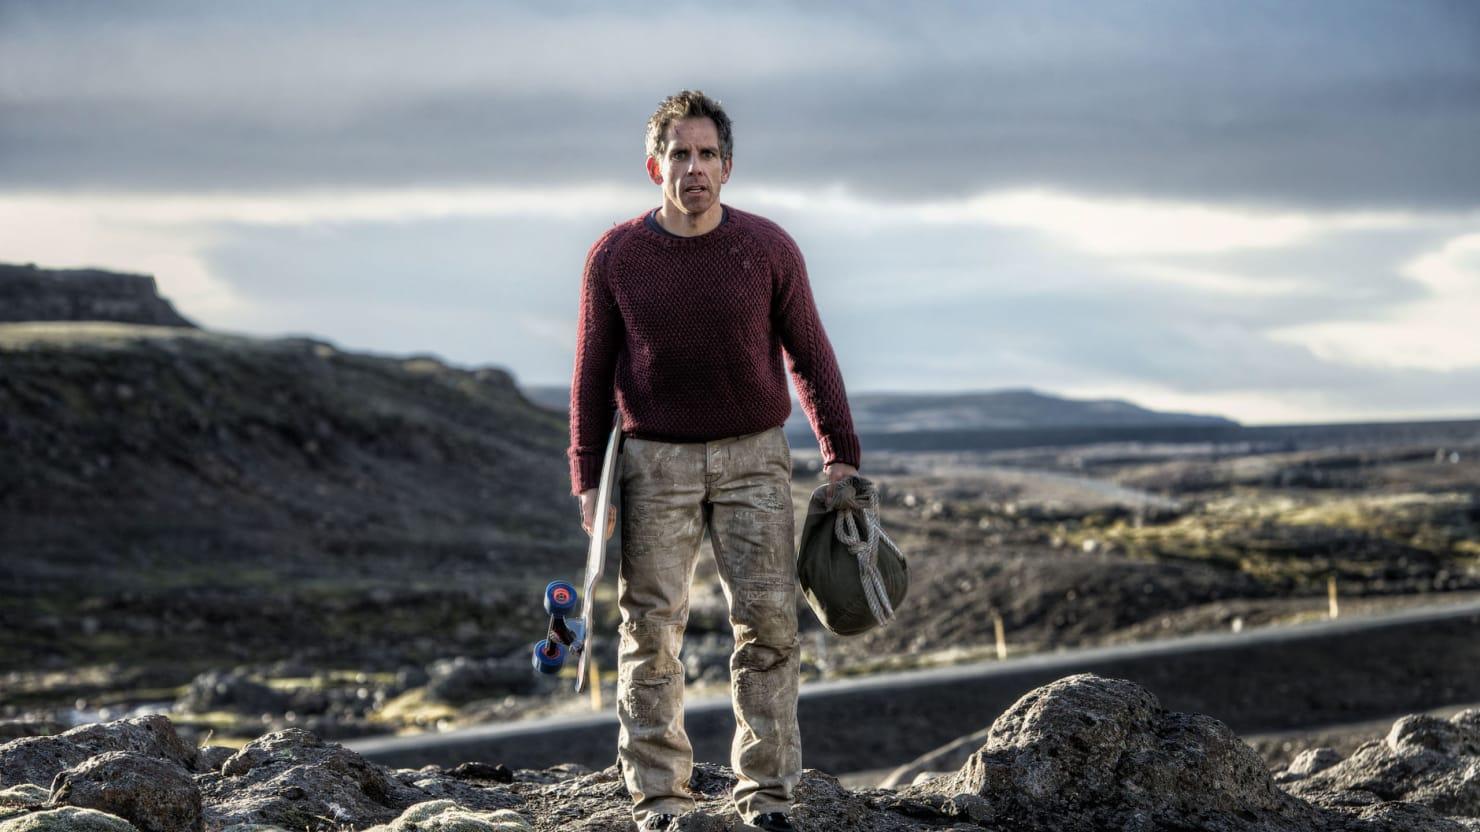 Ben Stiller's 'The Secret Life of Walter Mitty' Trailer Released